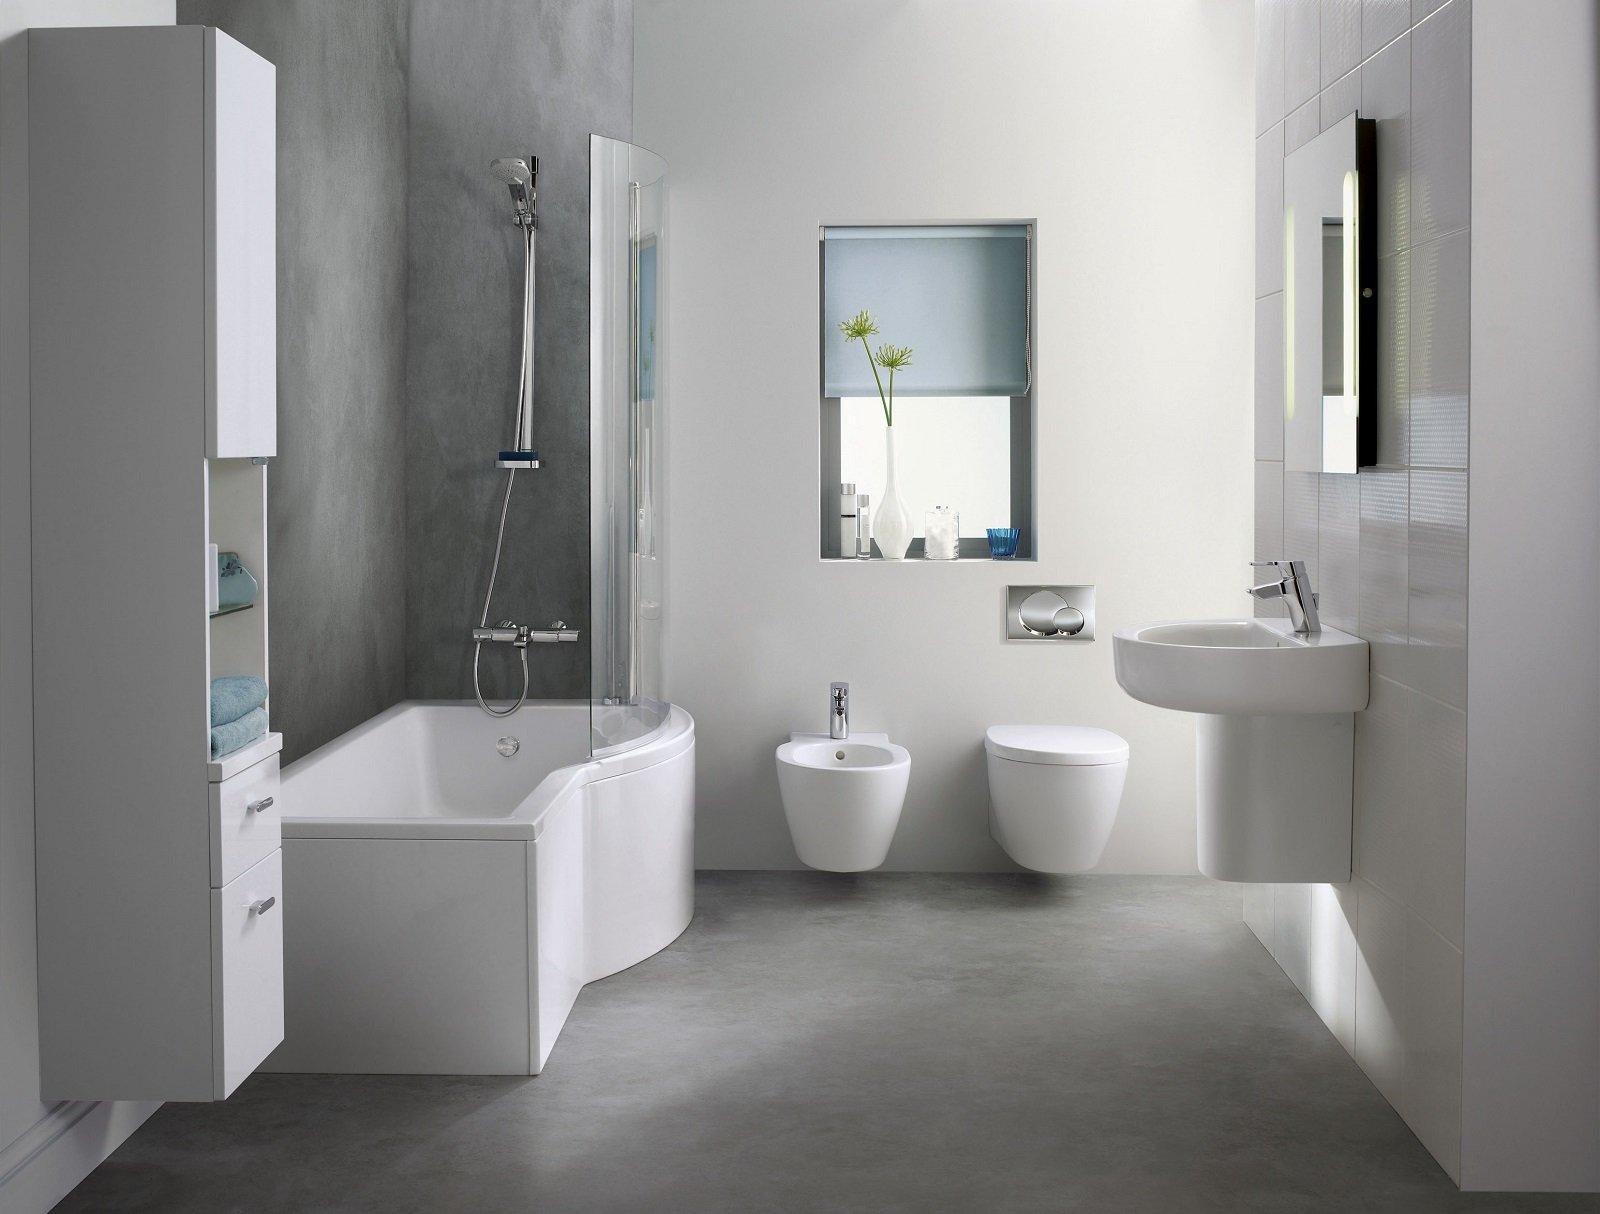 Le vasche a parete in materiali resistenti e di facile - Ideal standard vasche da bagno ...